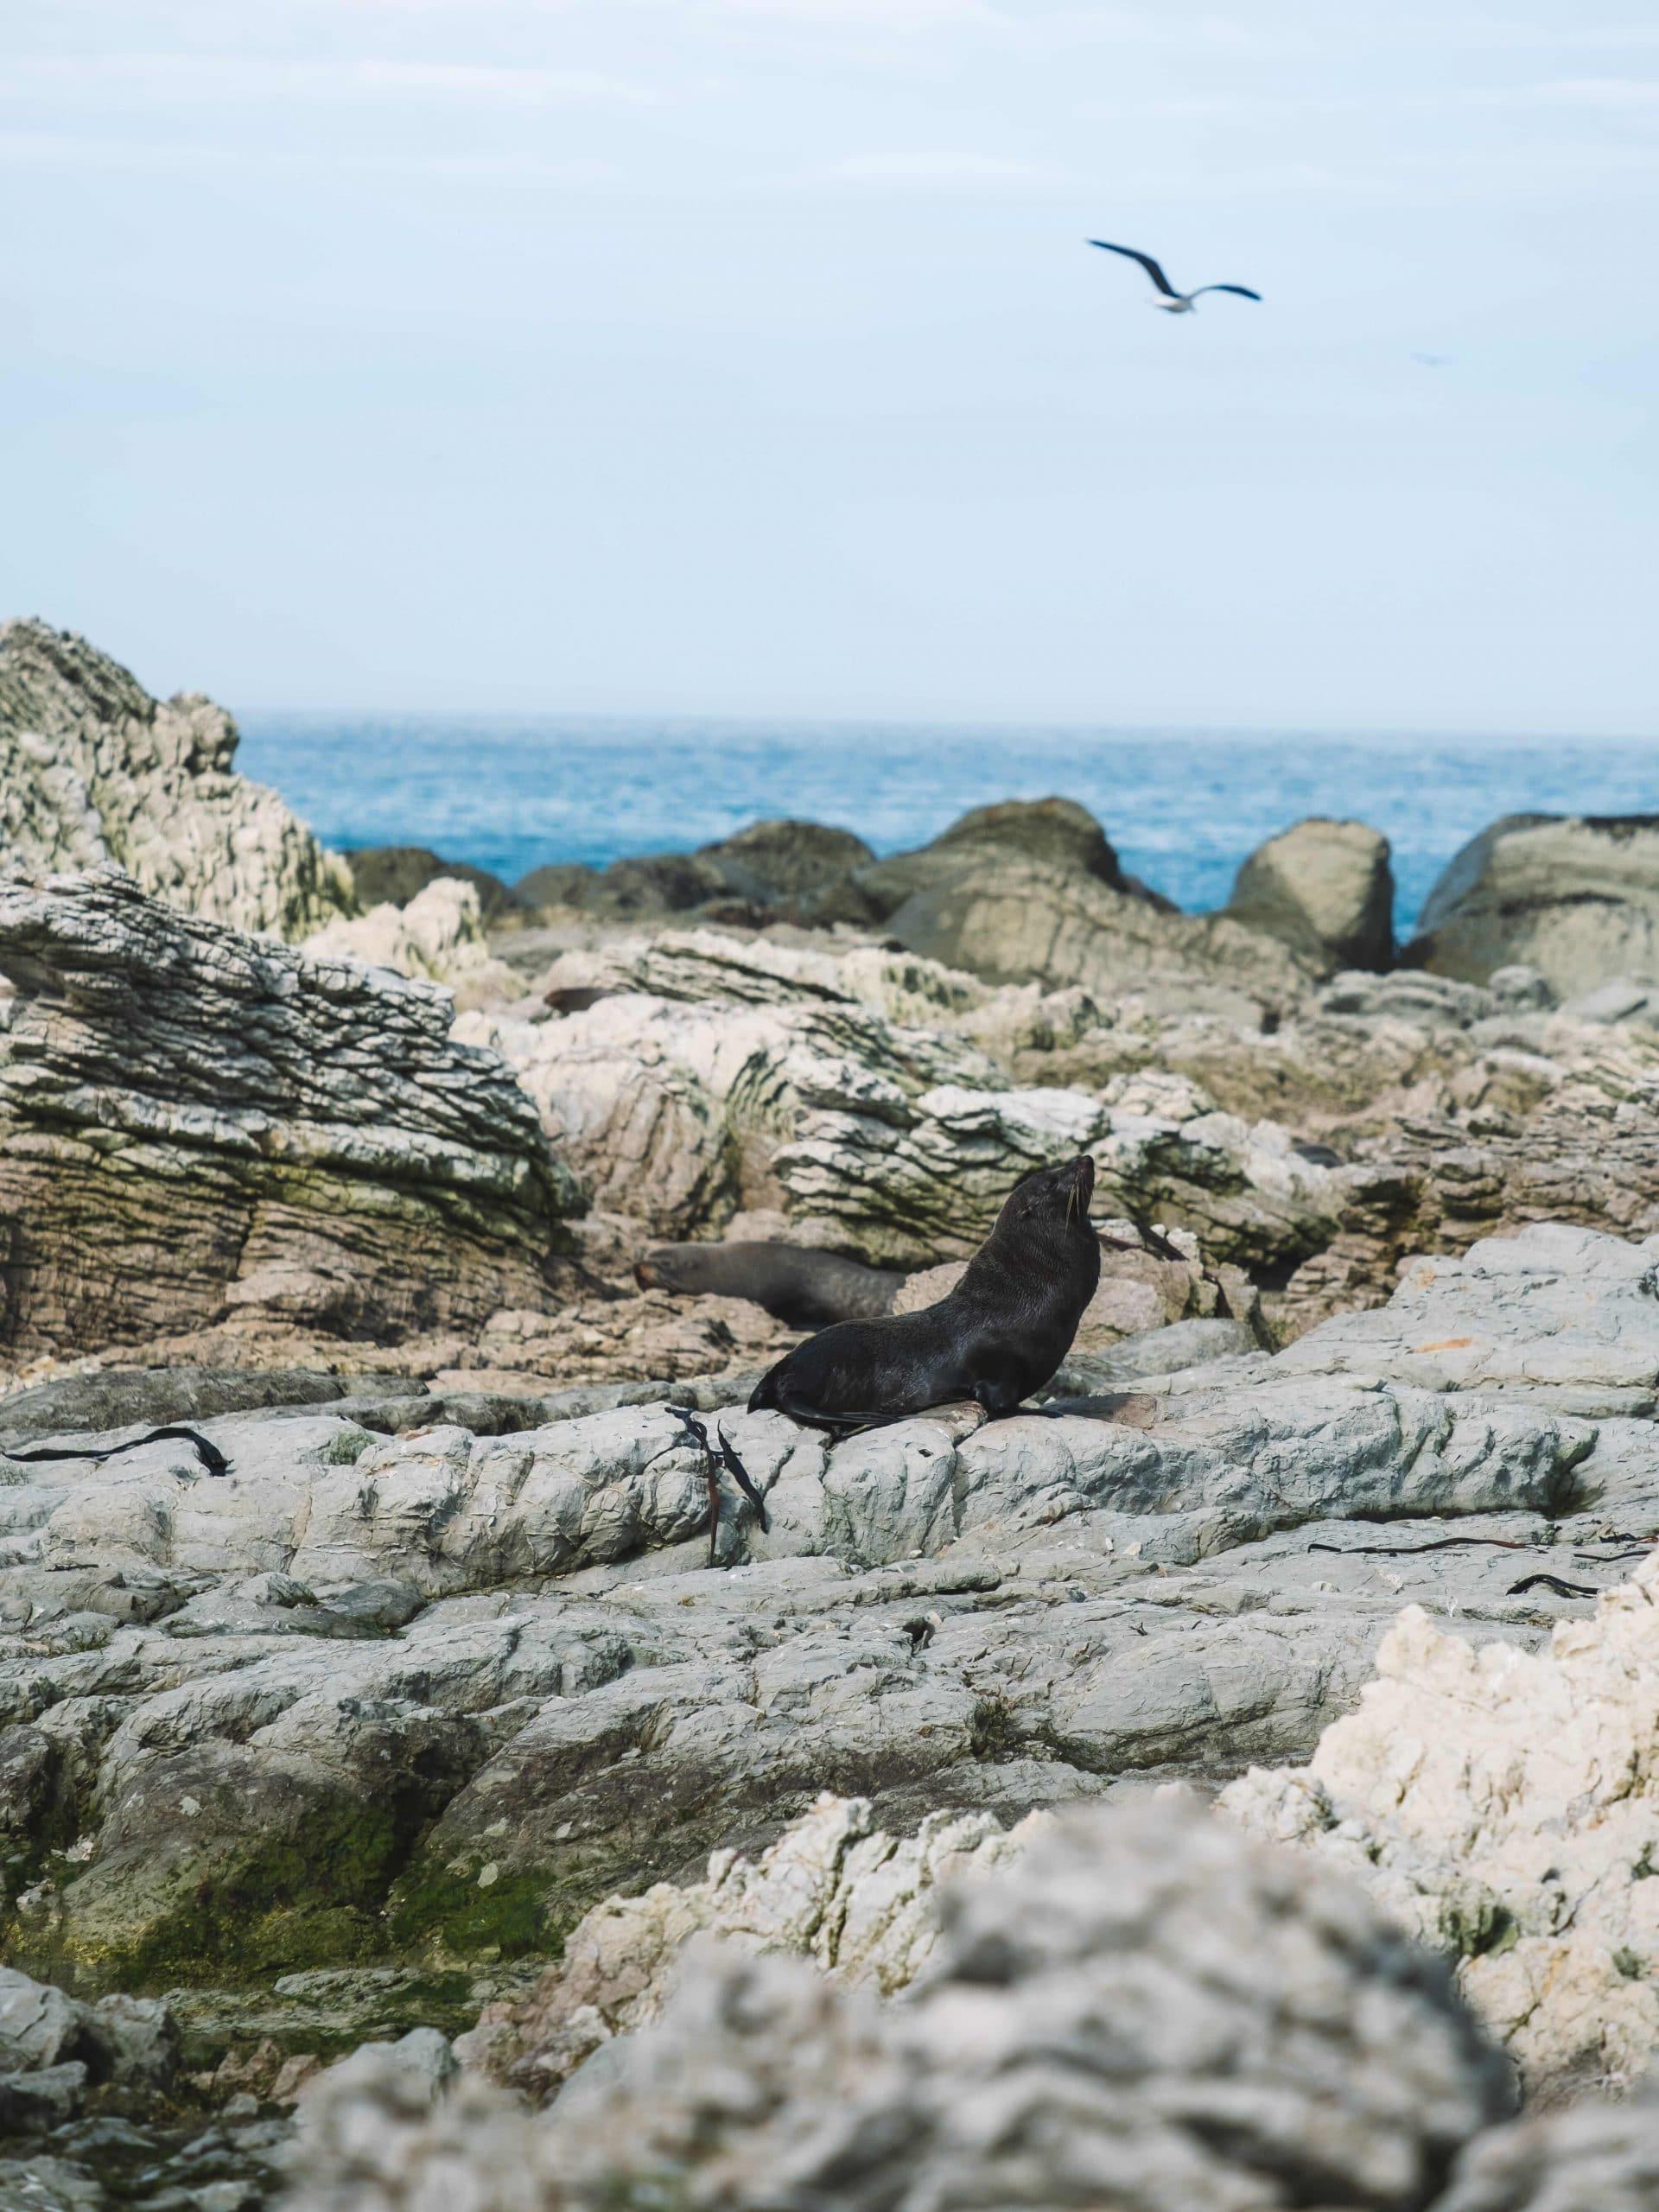 Seal pup sunbathes on the shore of Kaikoura, New Zealand